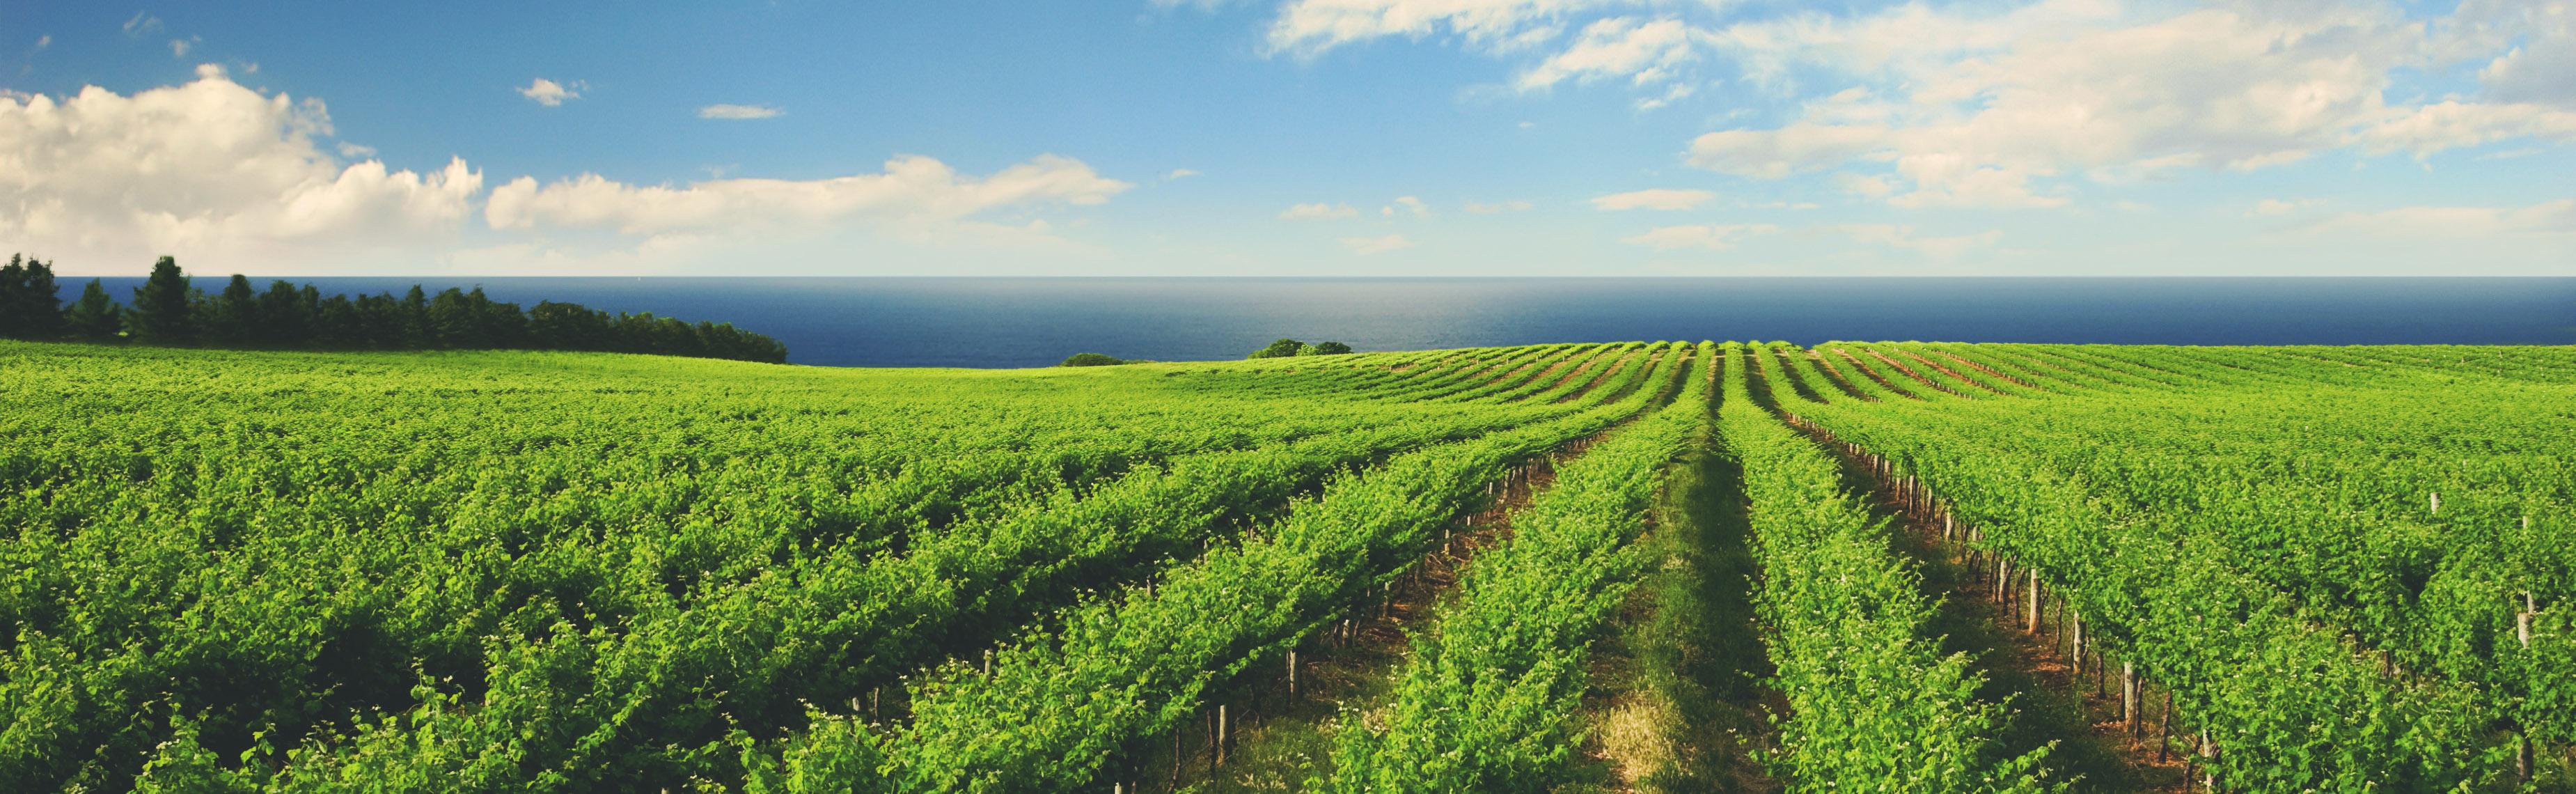 Litmus vineyard